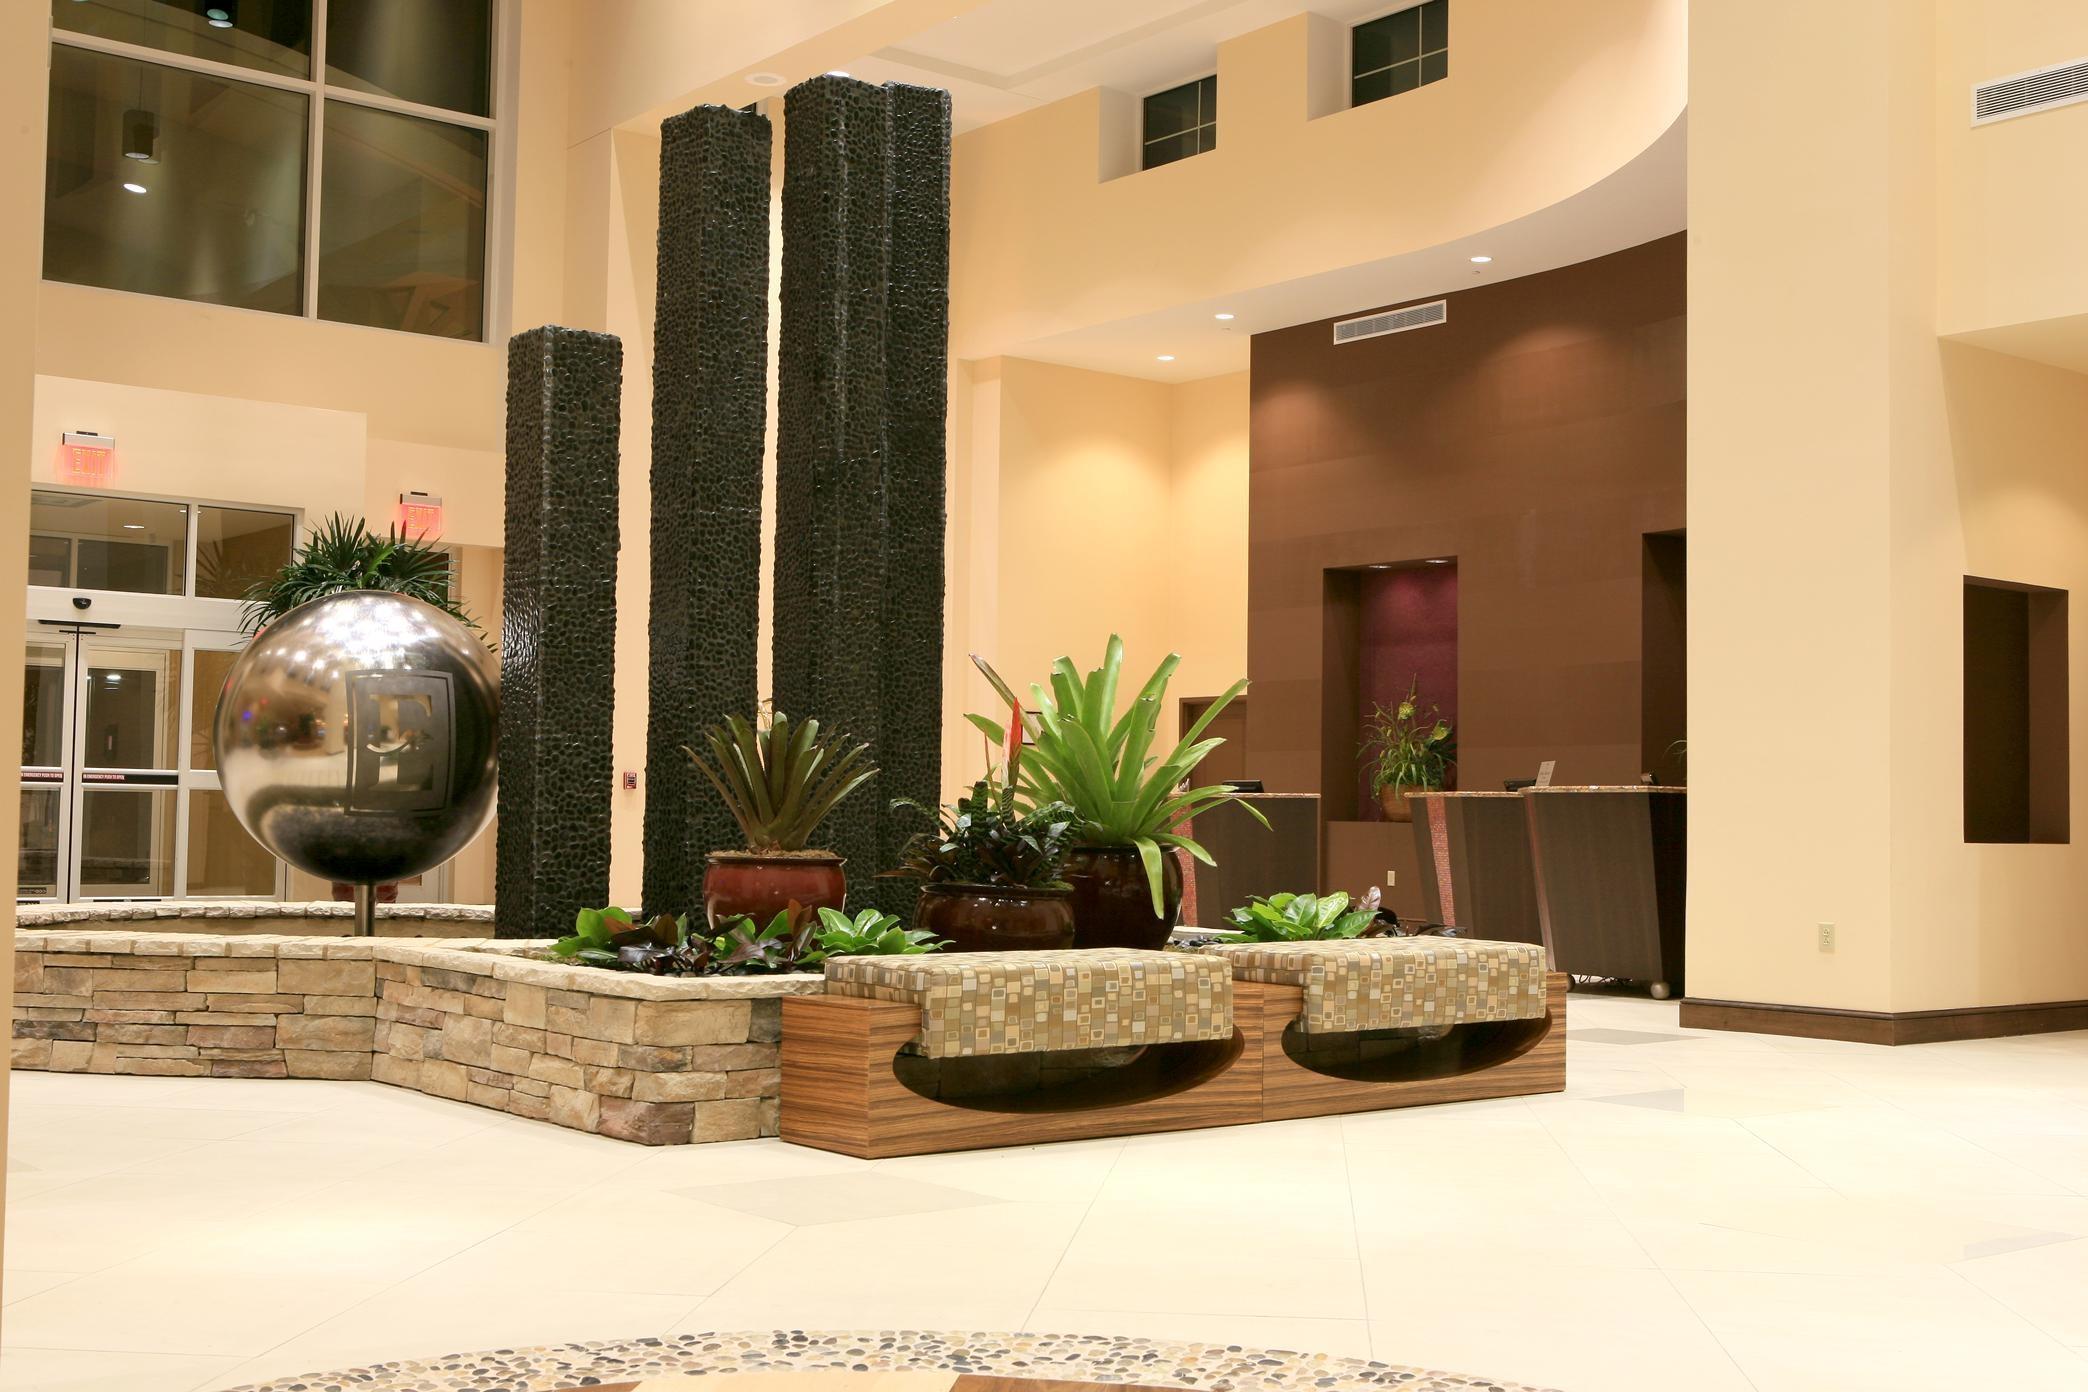 Embassy Suites by Hilton Birmingham Hoover image 11